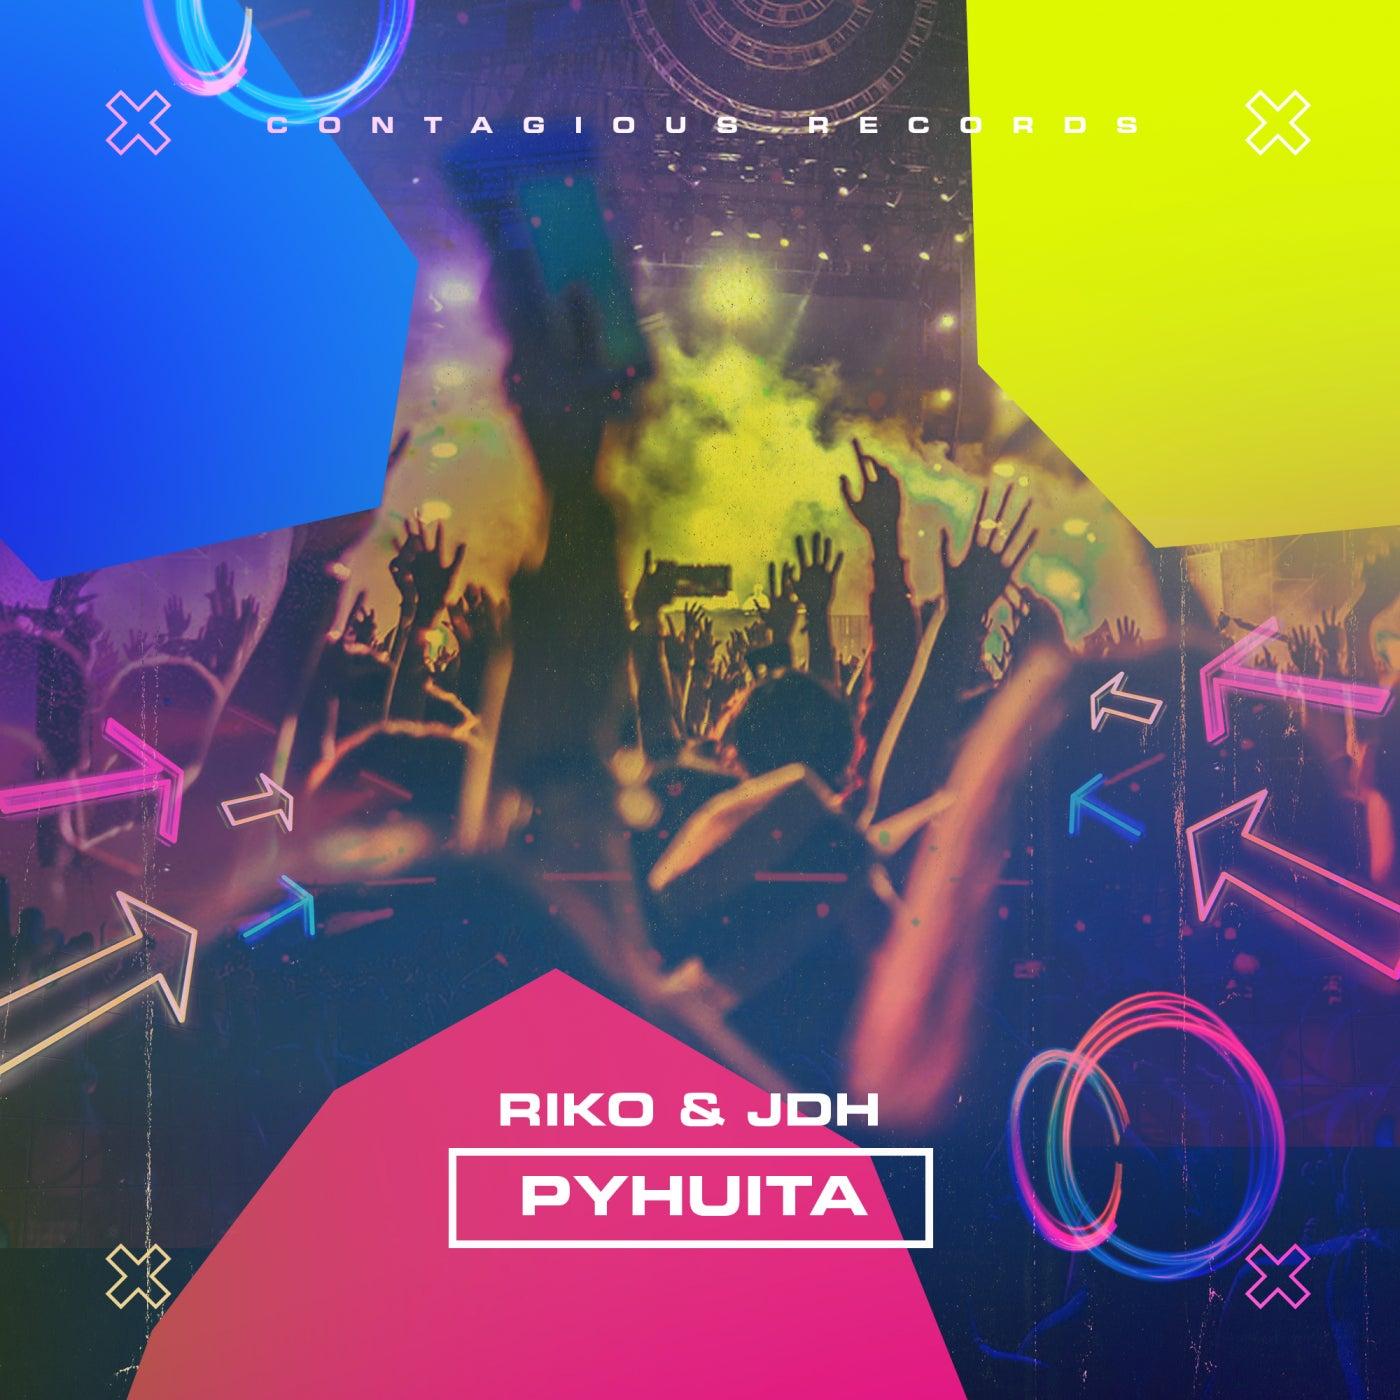 PYHUITA (Extended Mix)